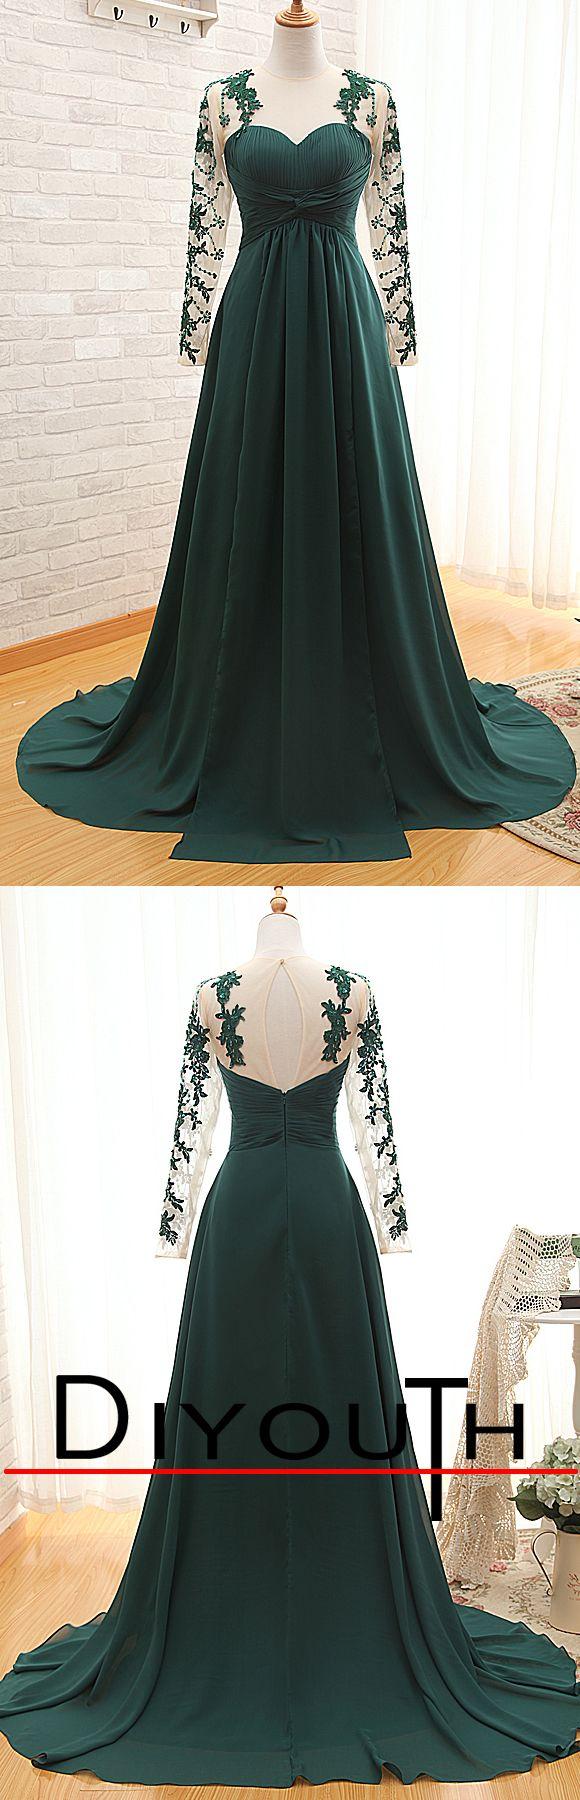 Gorgeous green prom dress   best Fashion dresses images on Pinterest  Clothes Graduation